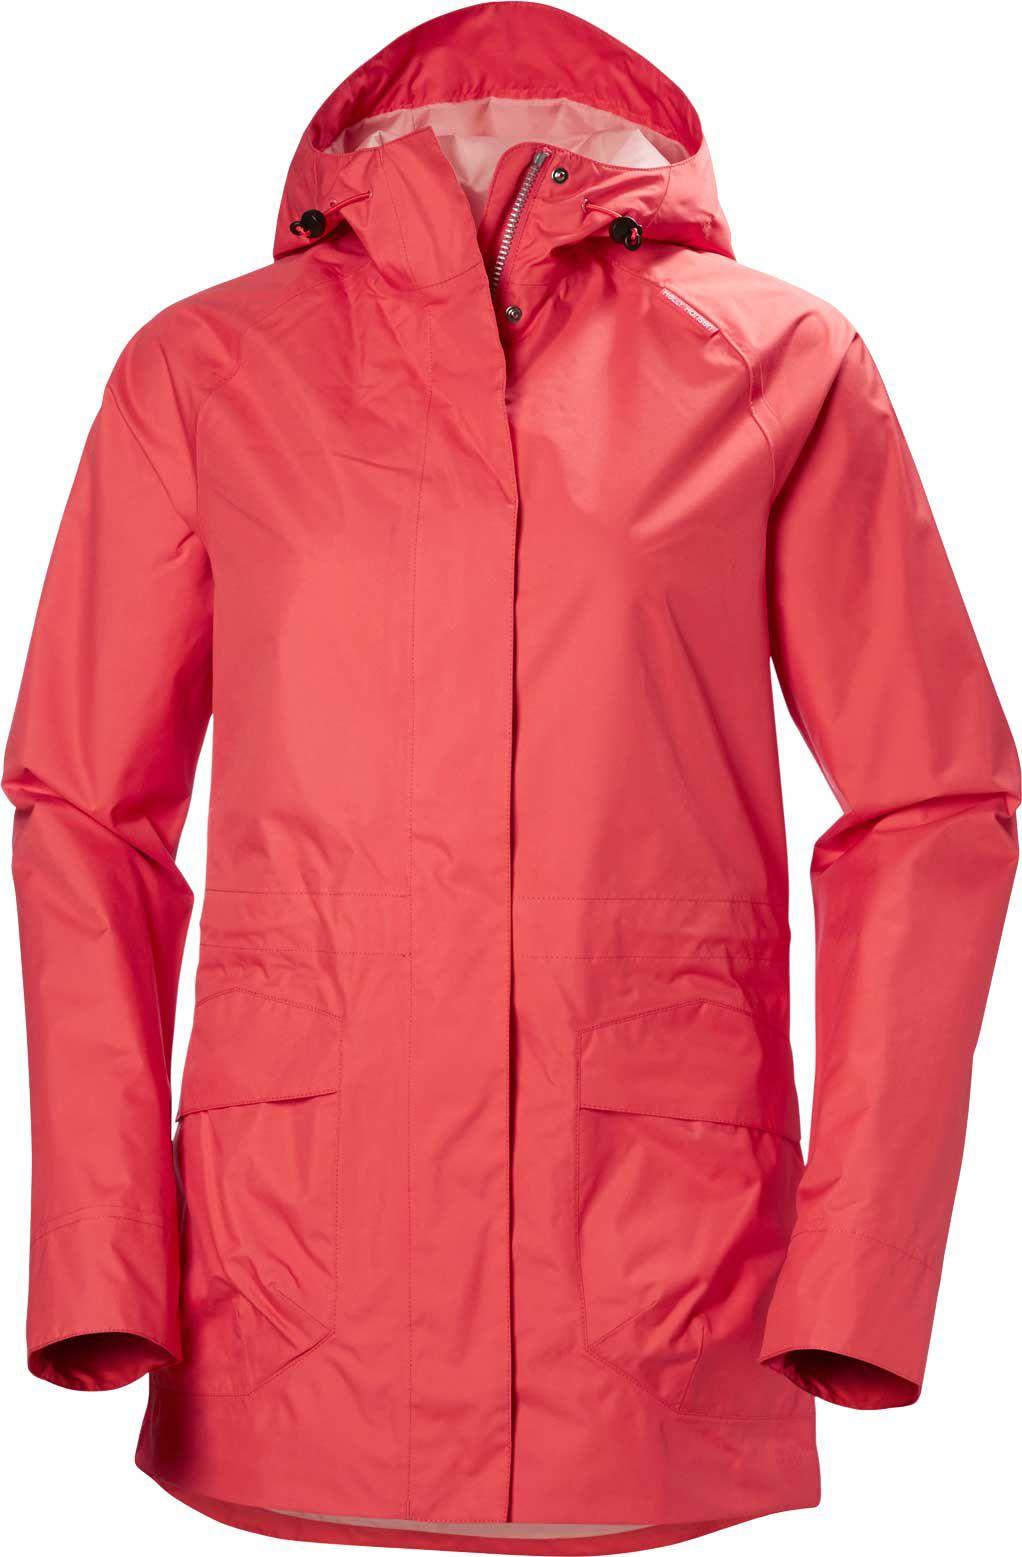 Best rain jacket portland